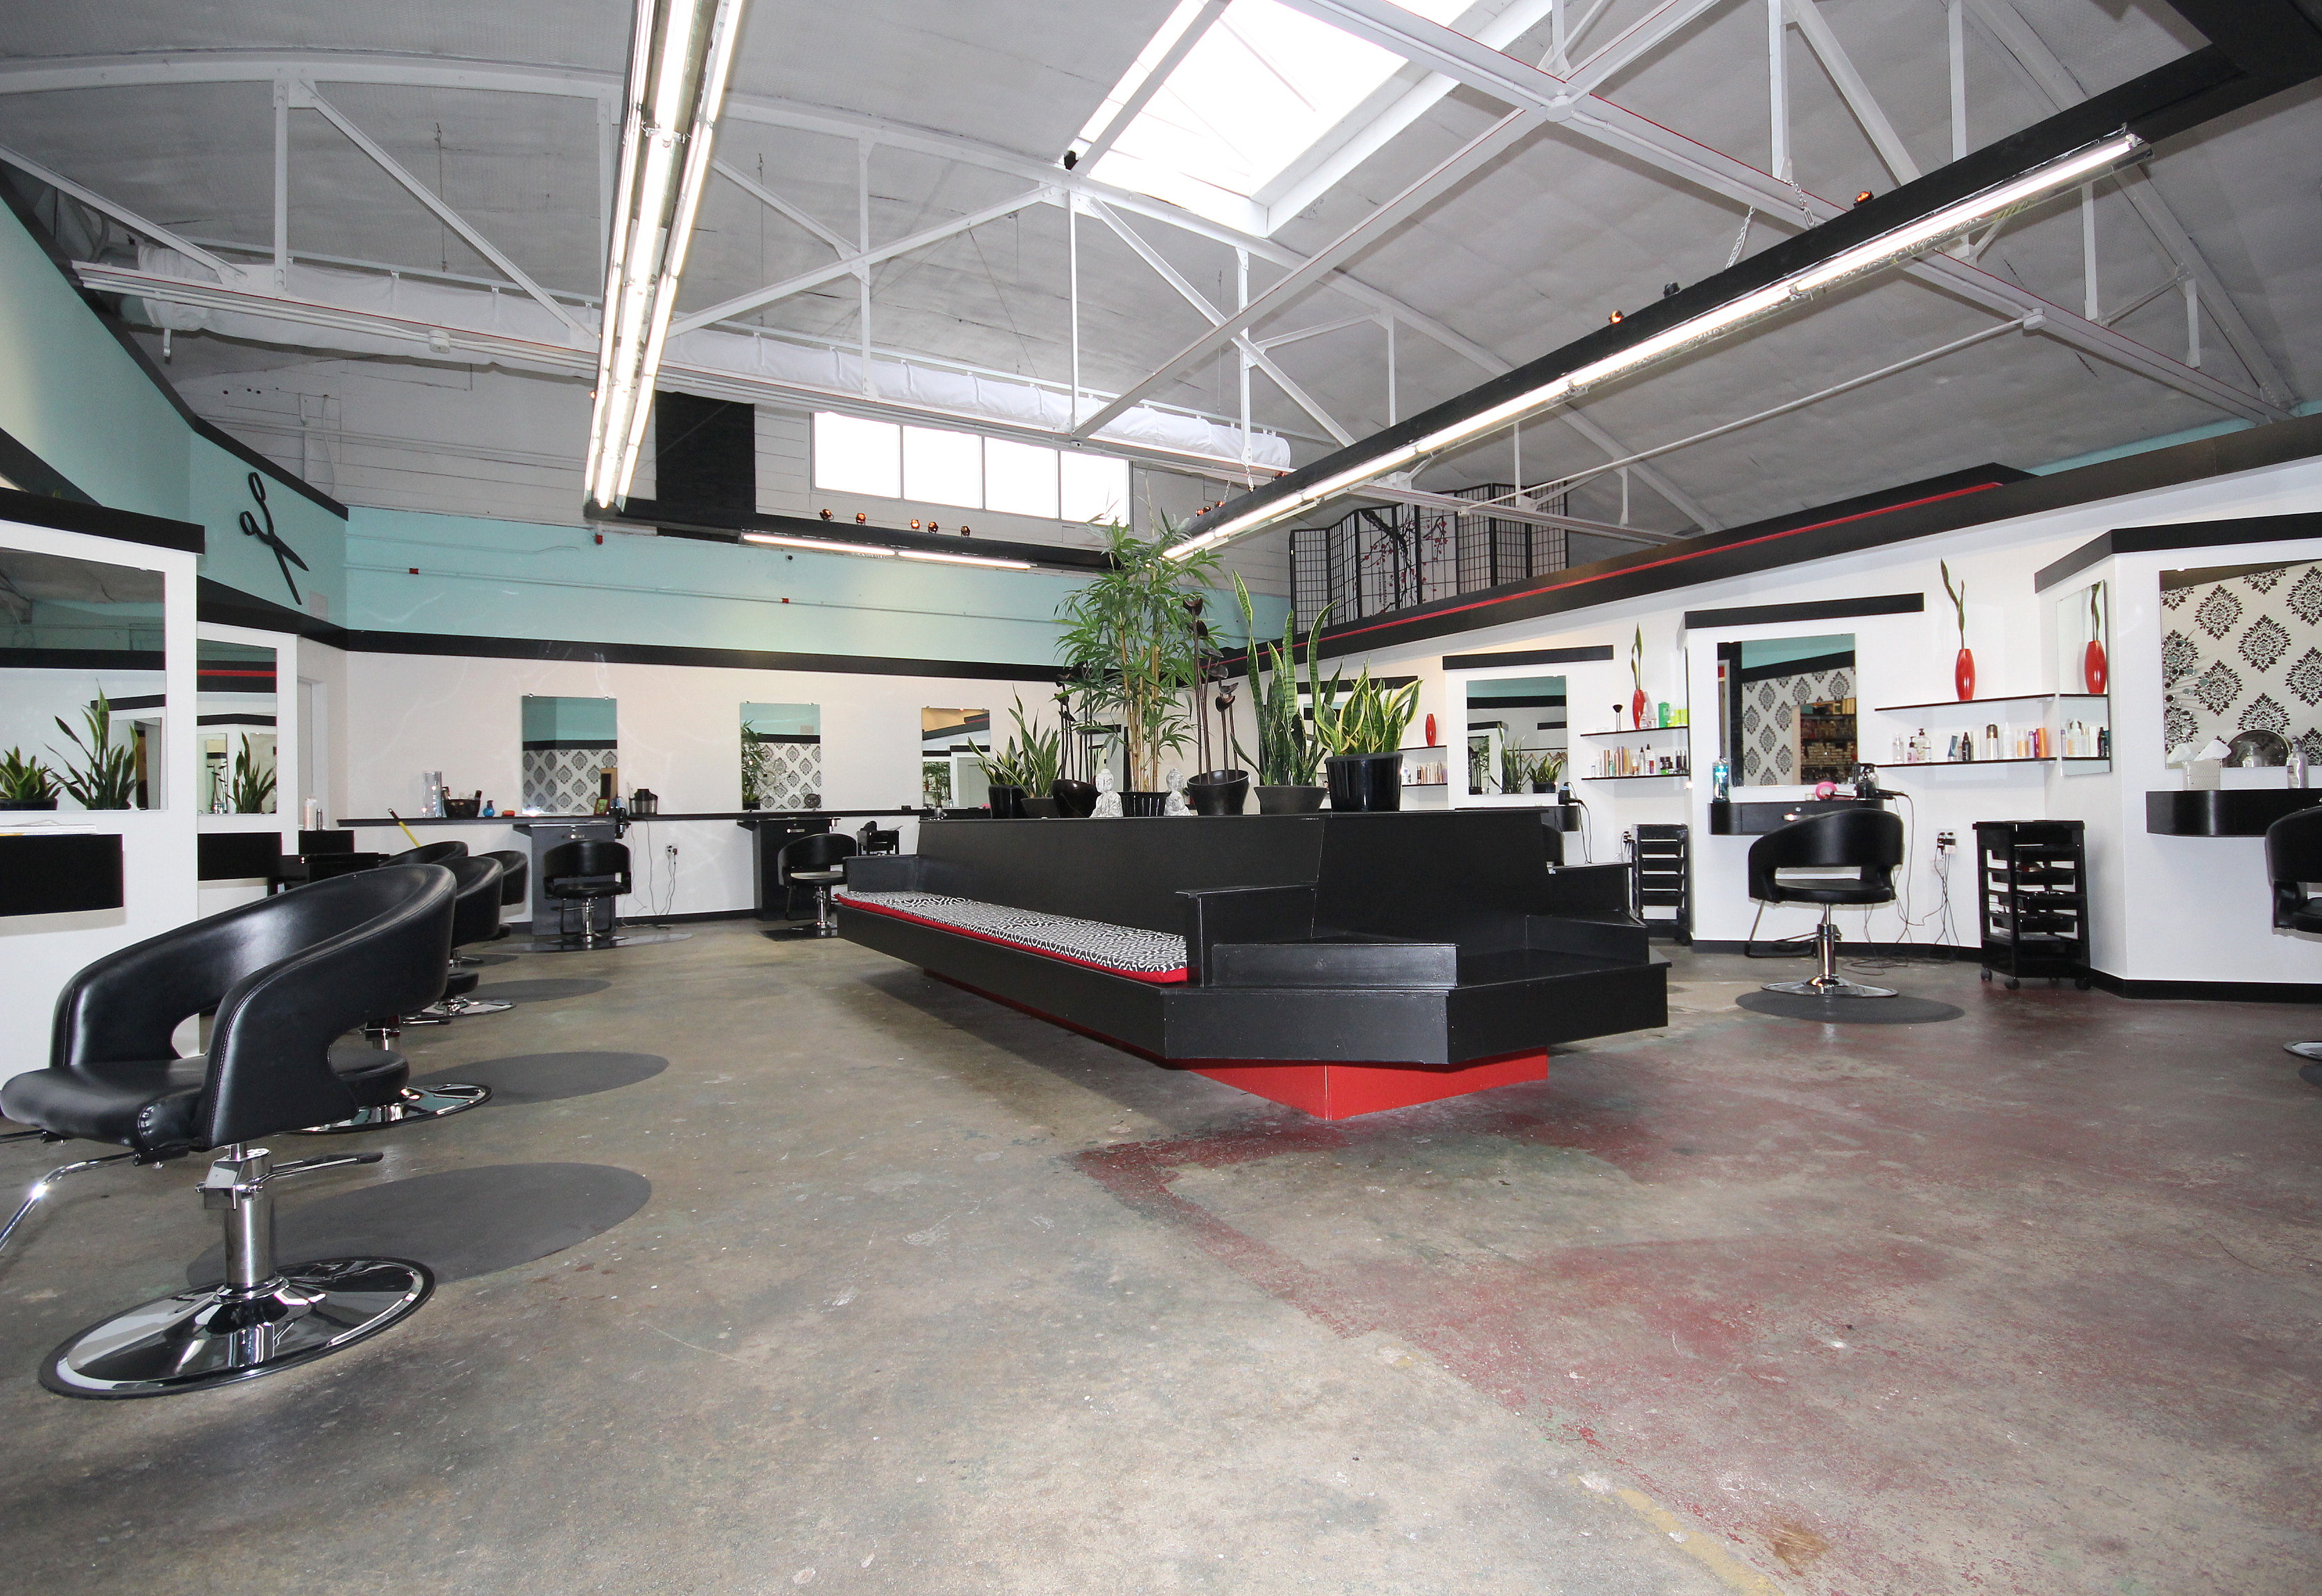 The inside of Studio 39 salon in downtown kansas city.